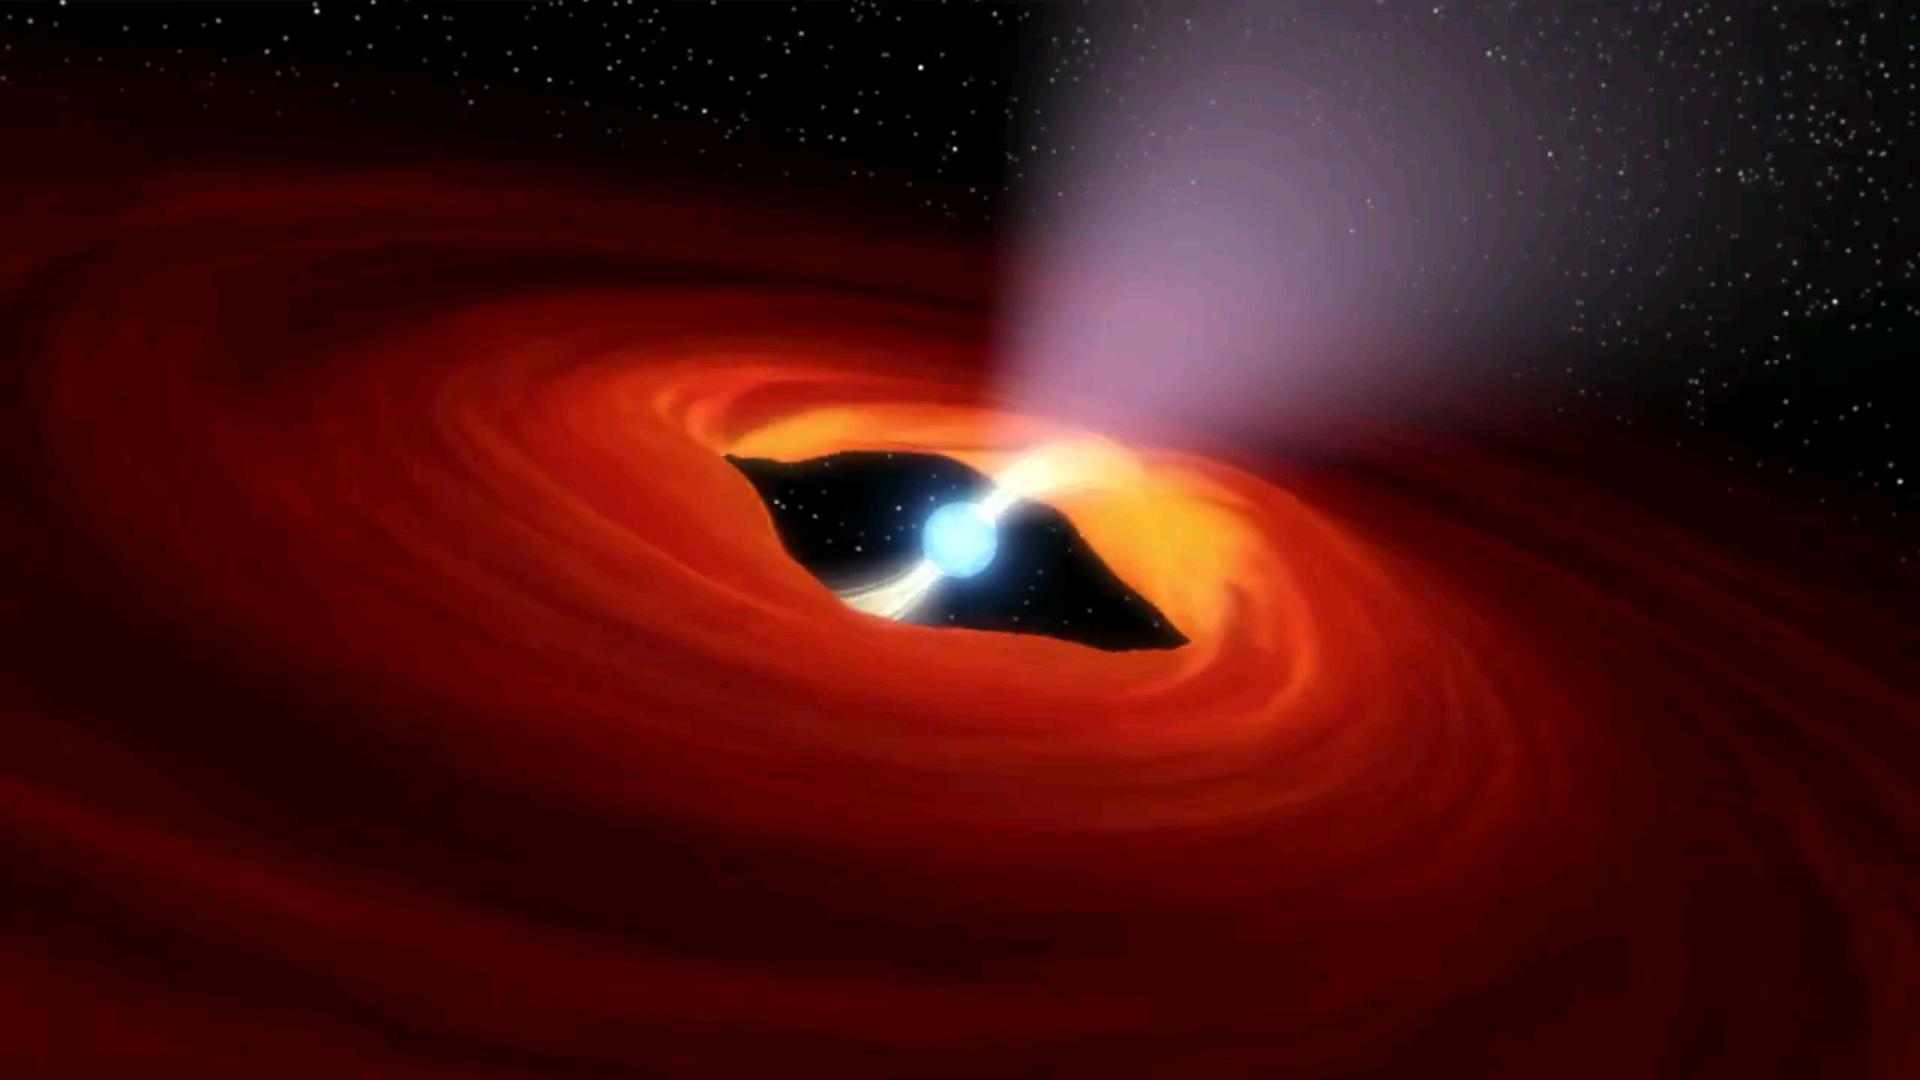 Artist's illustration of a rotating neutron star, the remnants of a super nova explosion. - Image Credit: NASA, Caltech-JPL